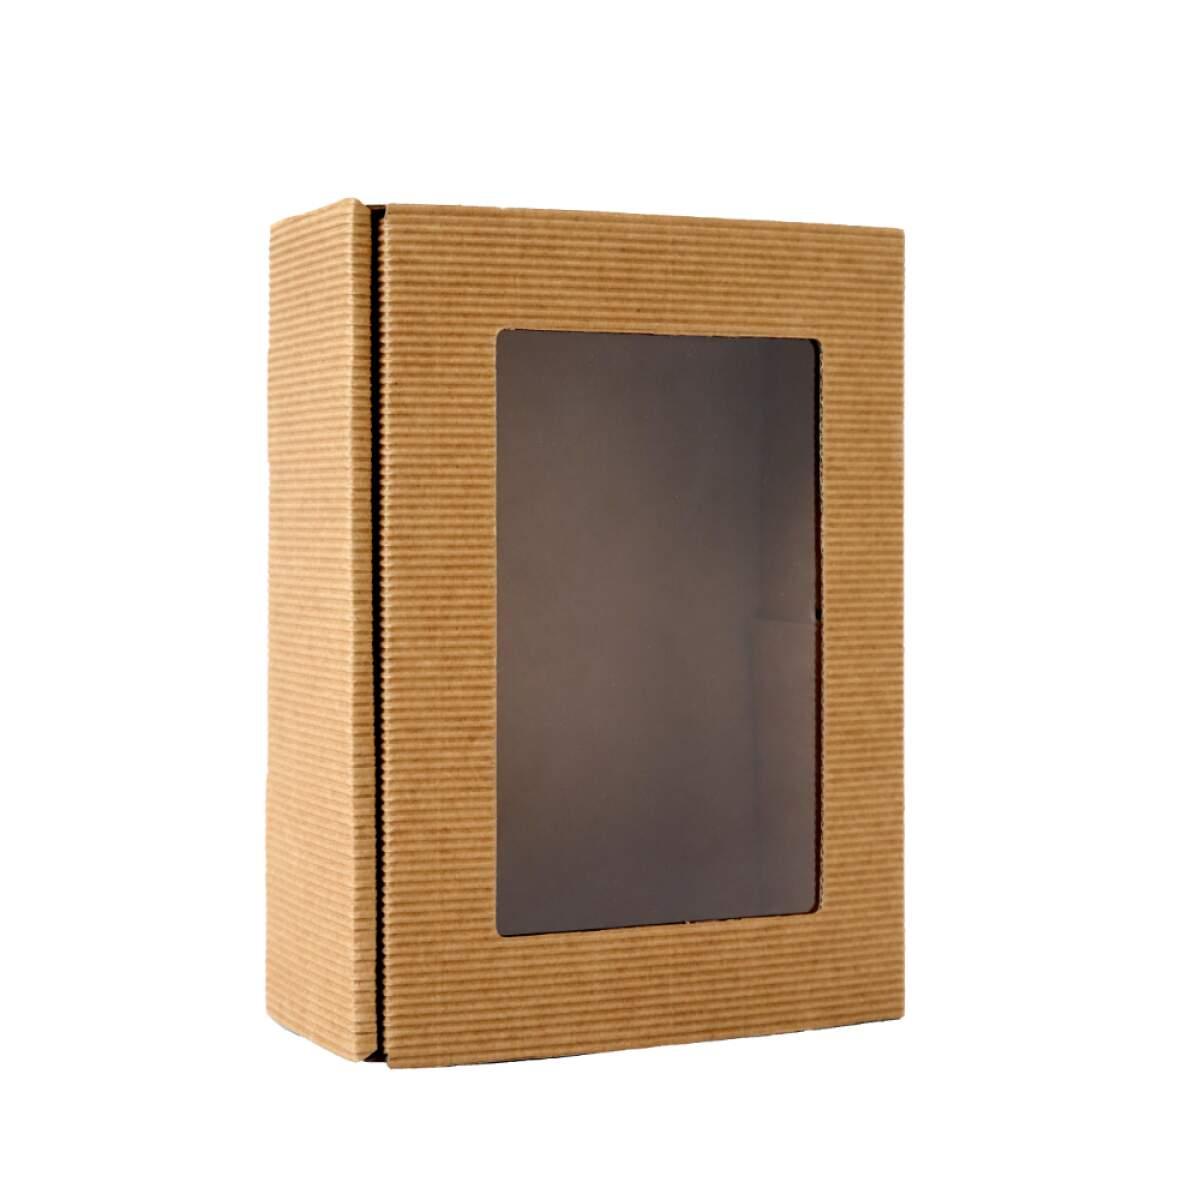 Box-Gr-M-m-Fenster-nature_2088_1000px